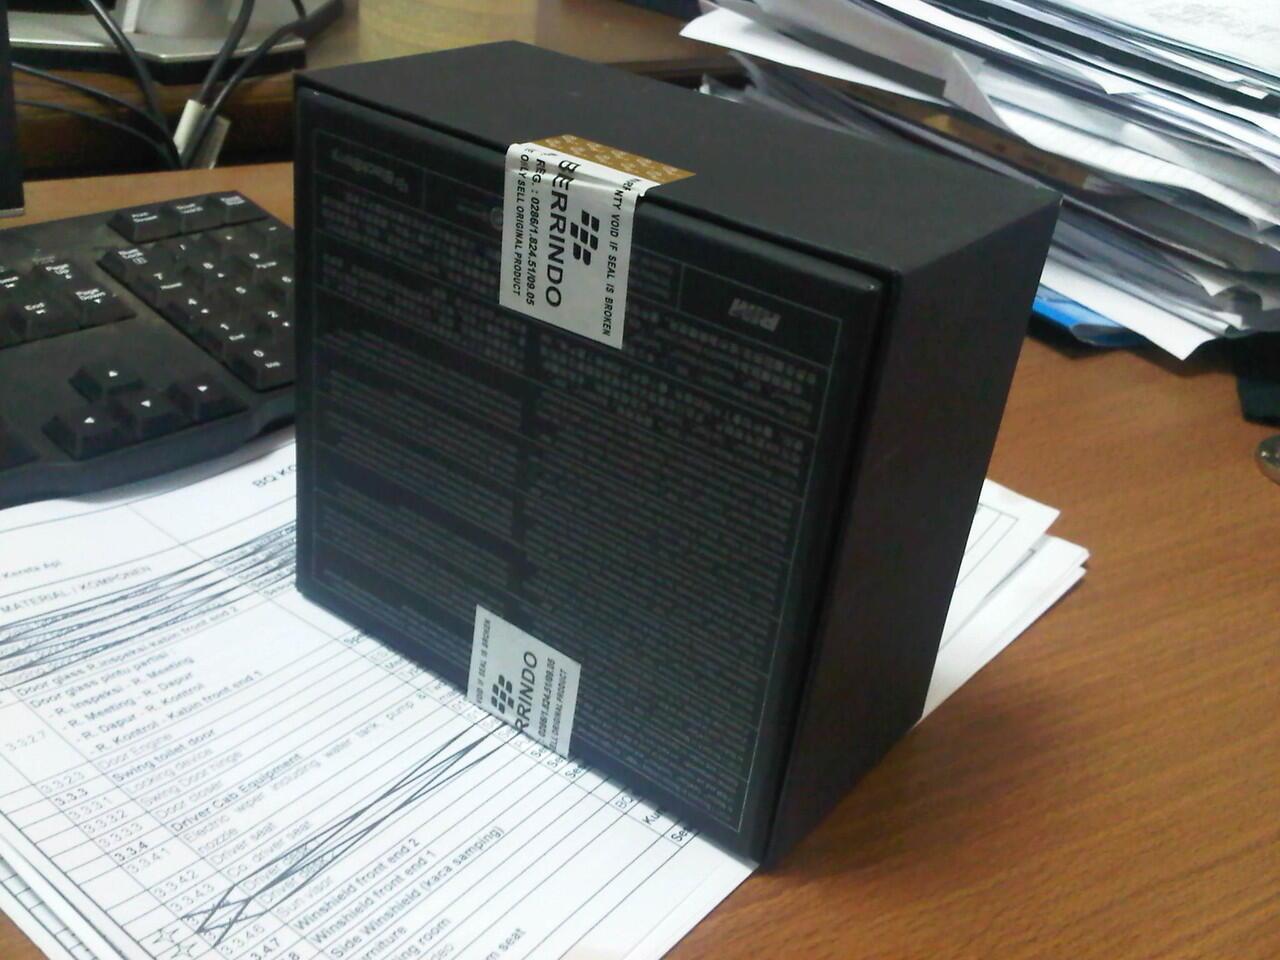 ??[BNOB] blackberry dakota 9900 hitam.BARU! ex hadiah grs berindo (SURABAYA-MADIUN)